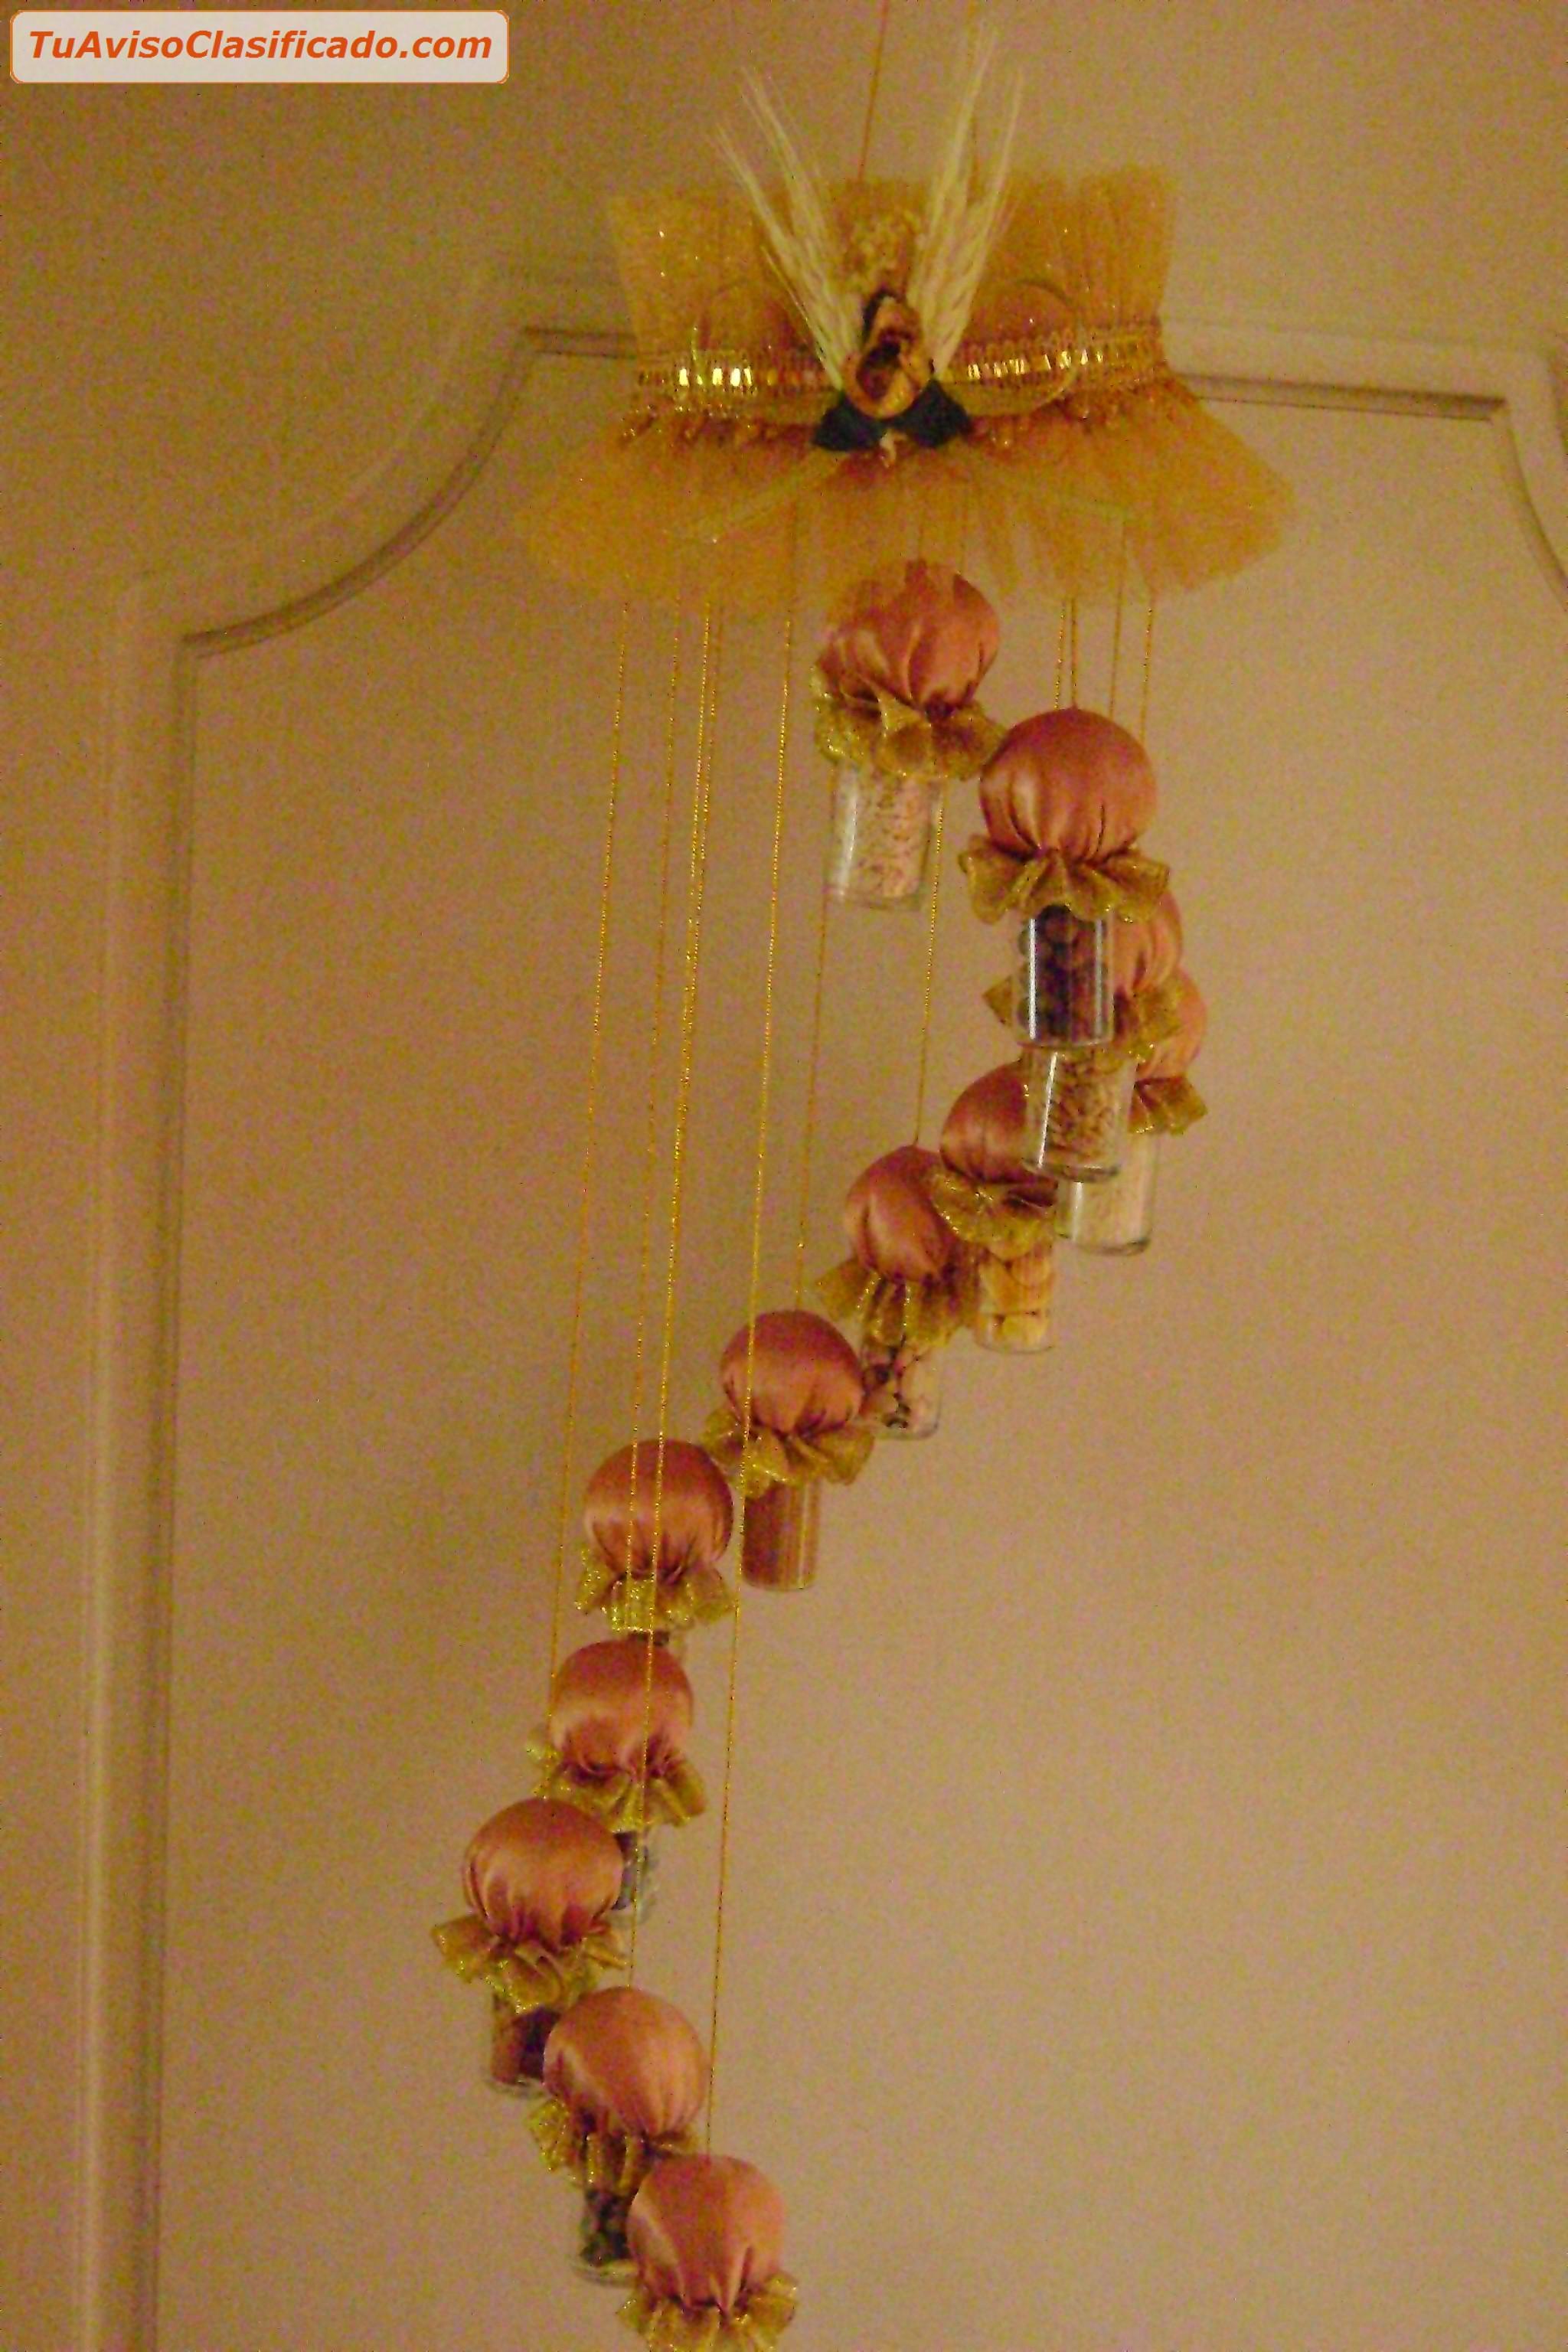 Adornos colgantes para el comedor o cocina adornos - Adornos para pared ...